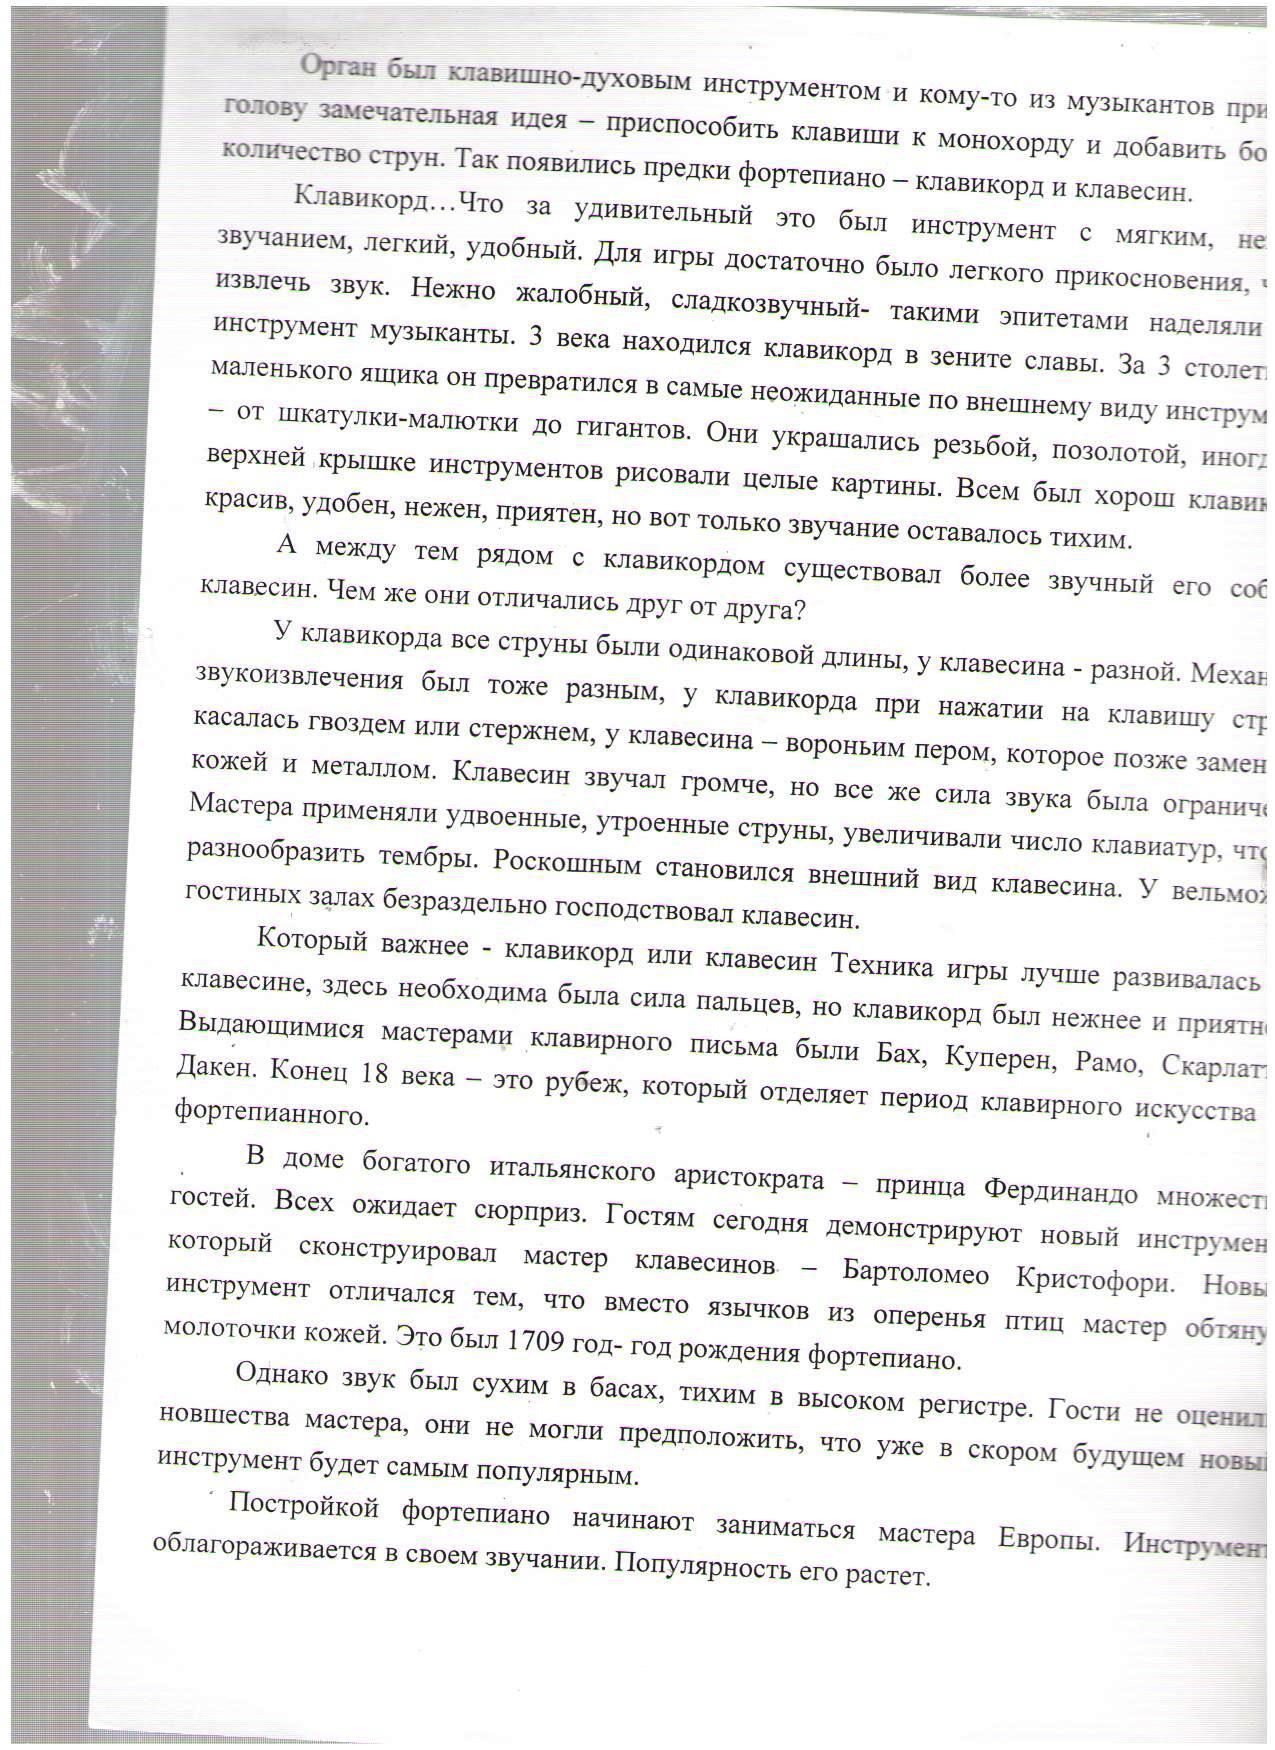 C:\Users\Нина\Desktop\Пономарева\внекл4 002.jpg